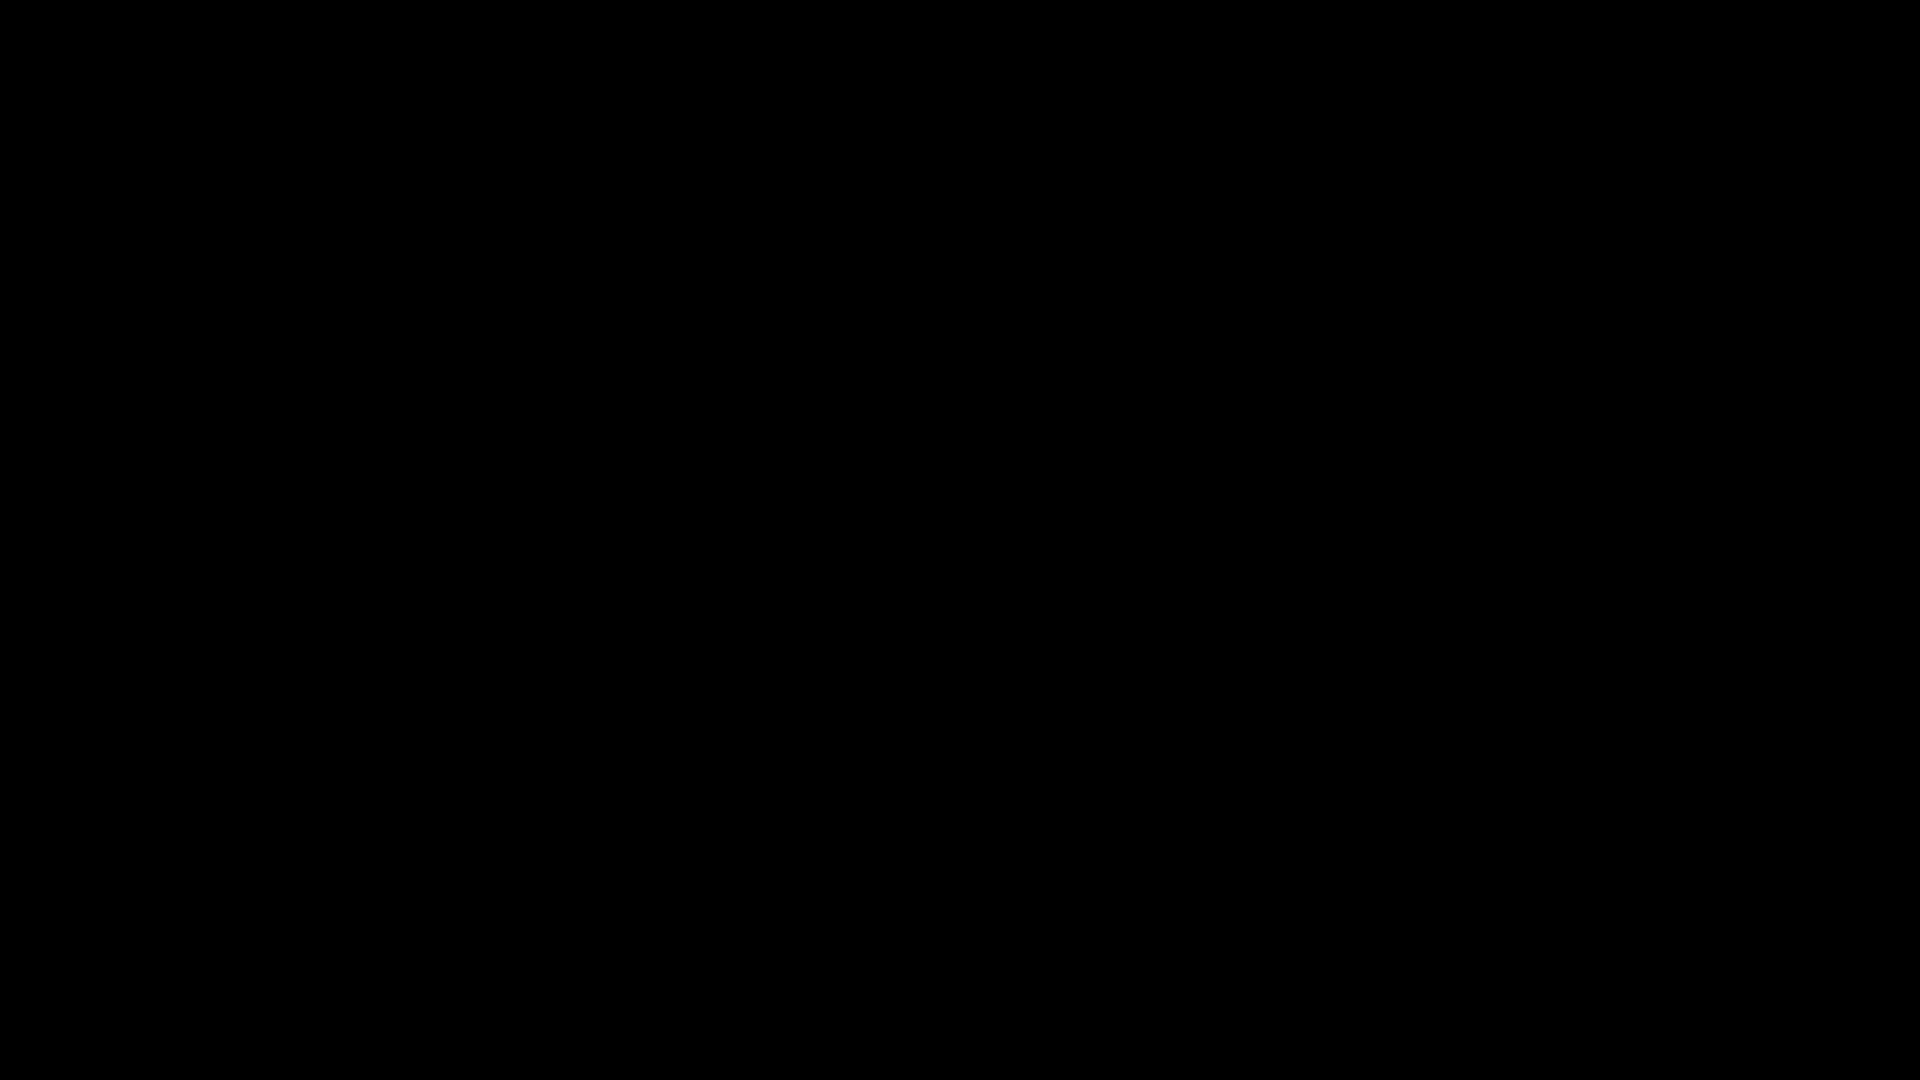 centipede pit